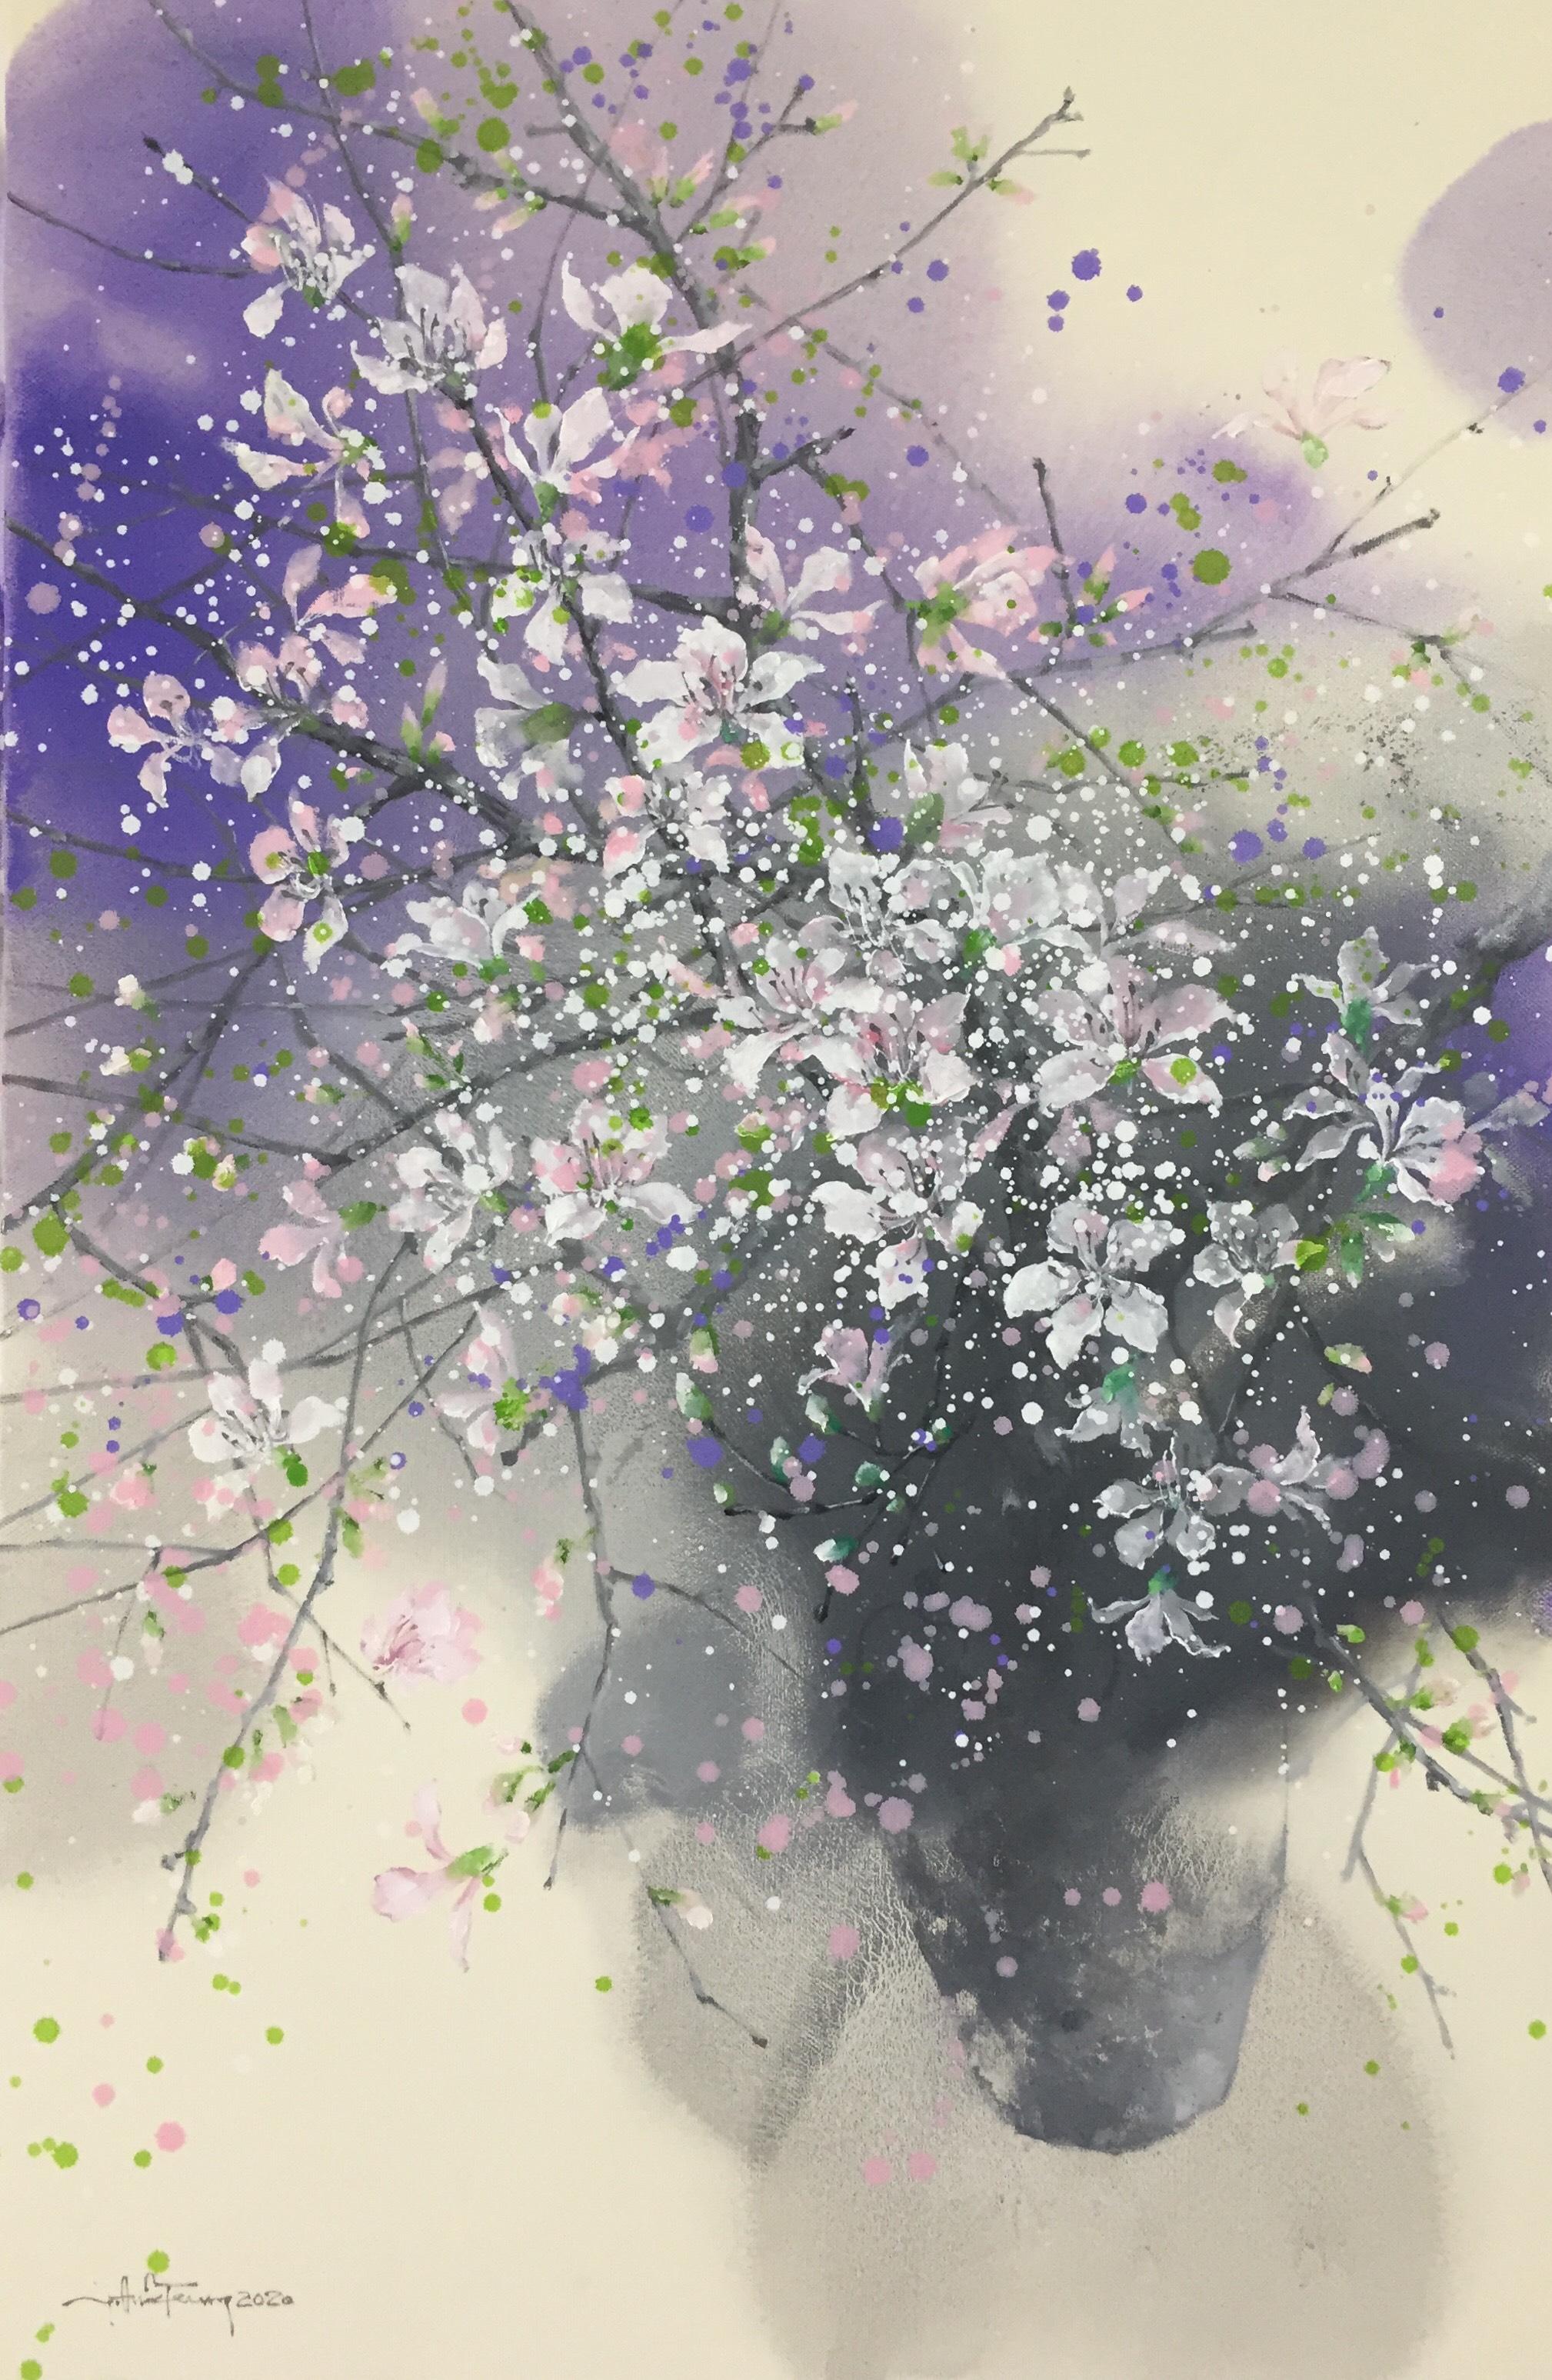 Spring Comes - Ban Flowers | Hoa Ban